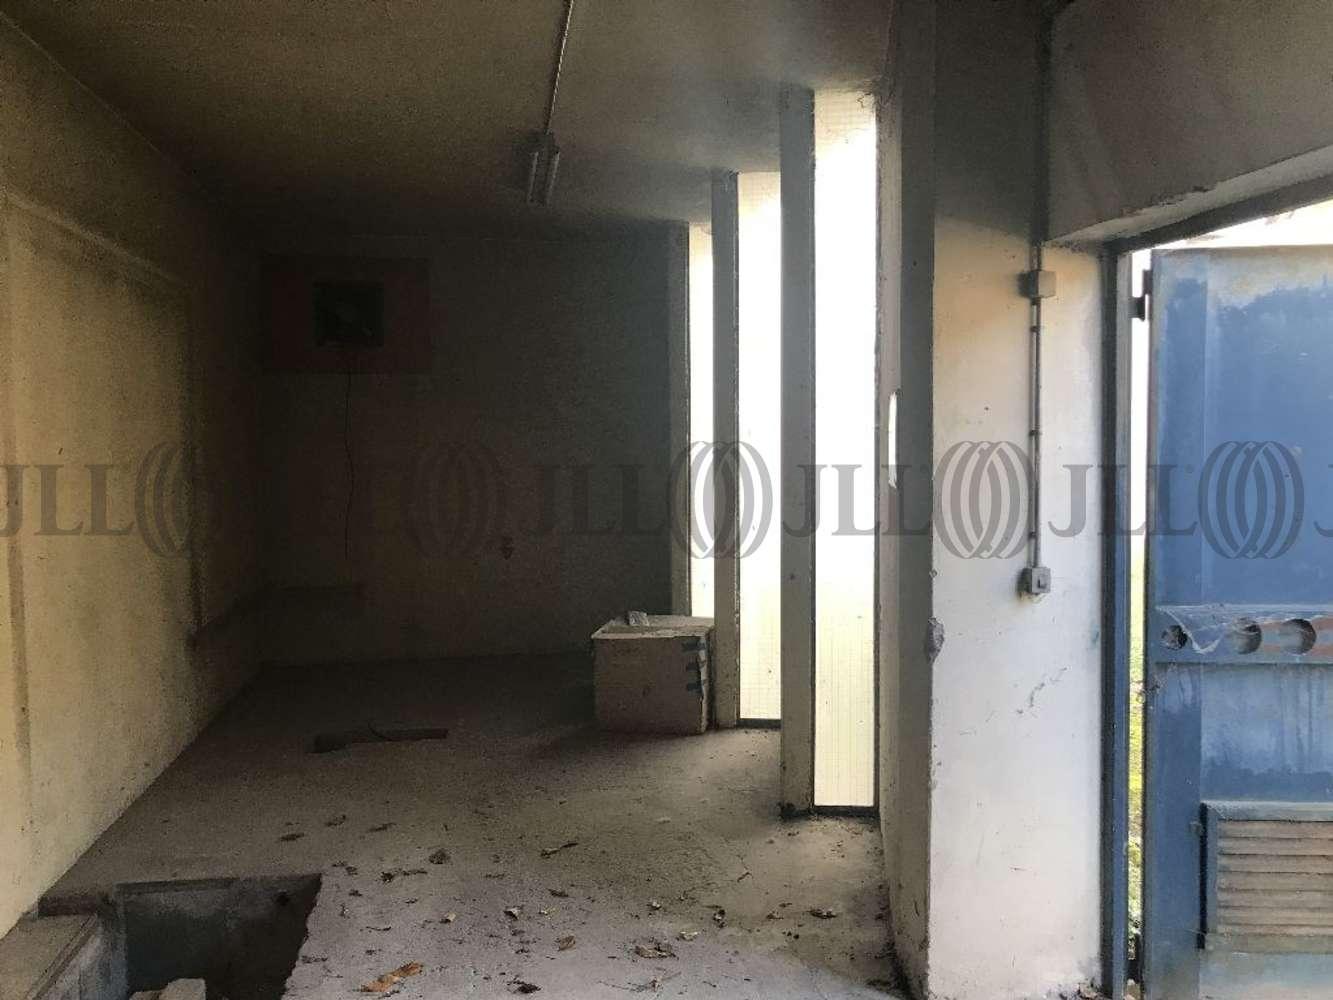 Activités/entrepôt Genay, 69730 - Entrepot à vendre Lyon Nord - Genay - 10312226